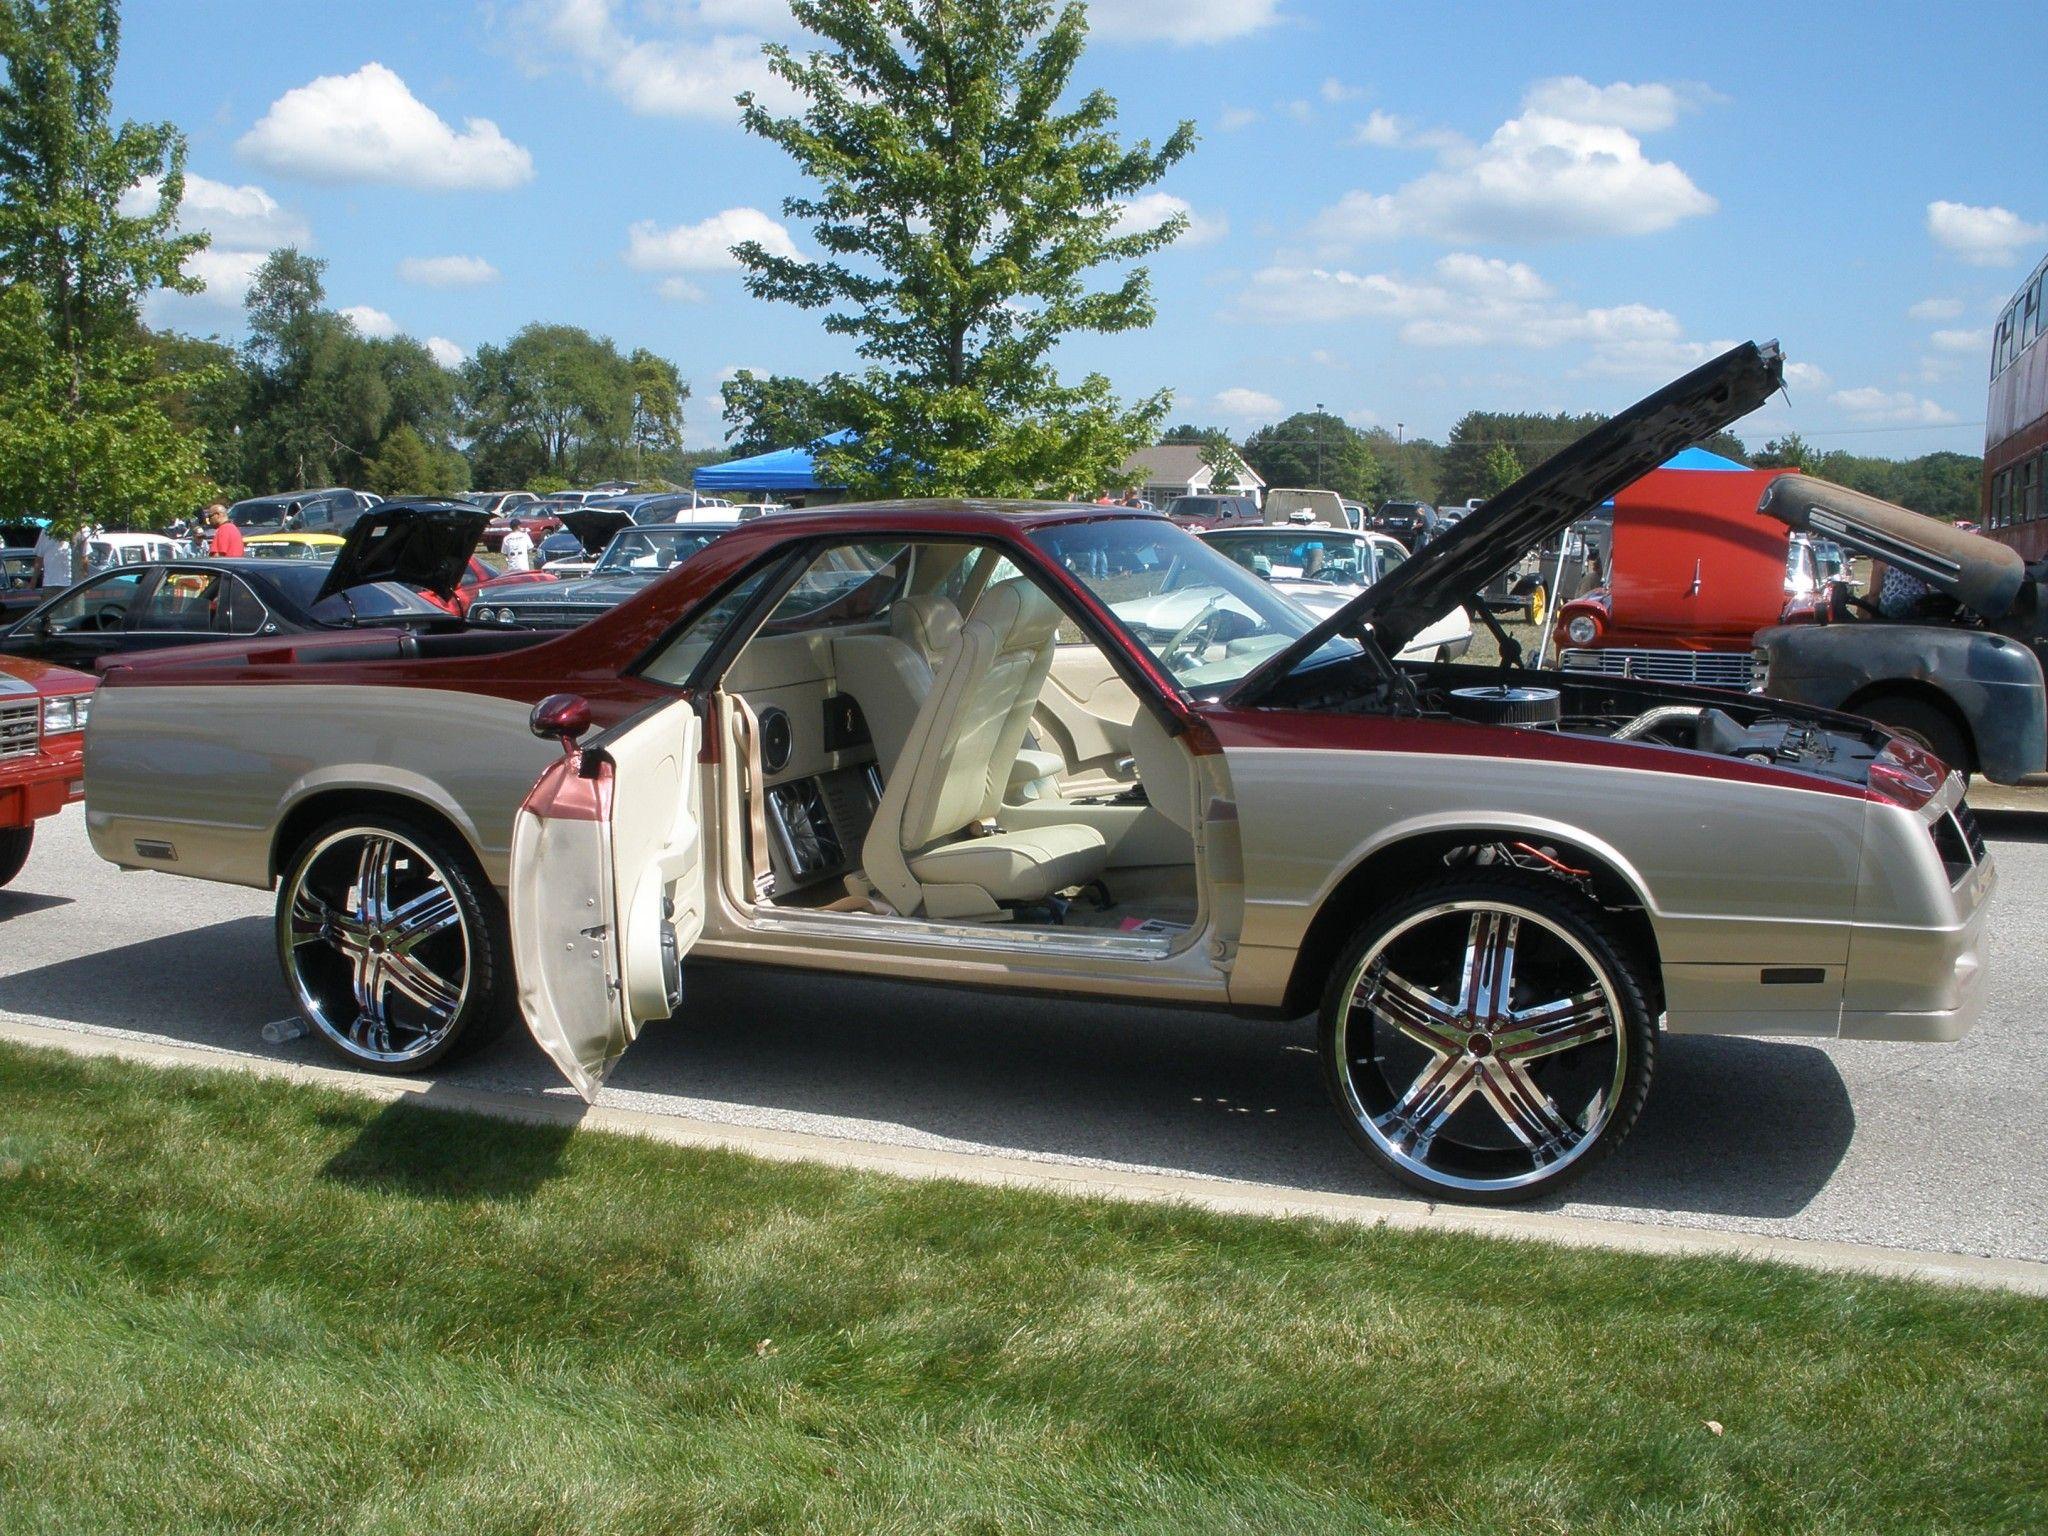 small resolution of 30 inch rims on impala box chevy on 30 inch ballers wheels big rims custom wheels